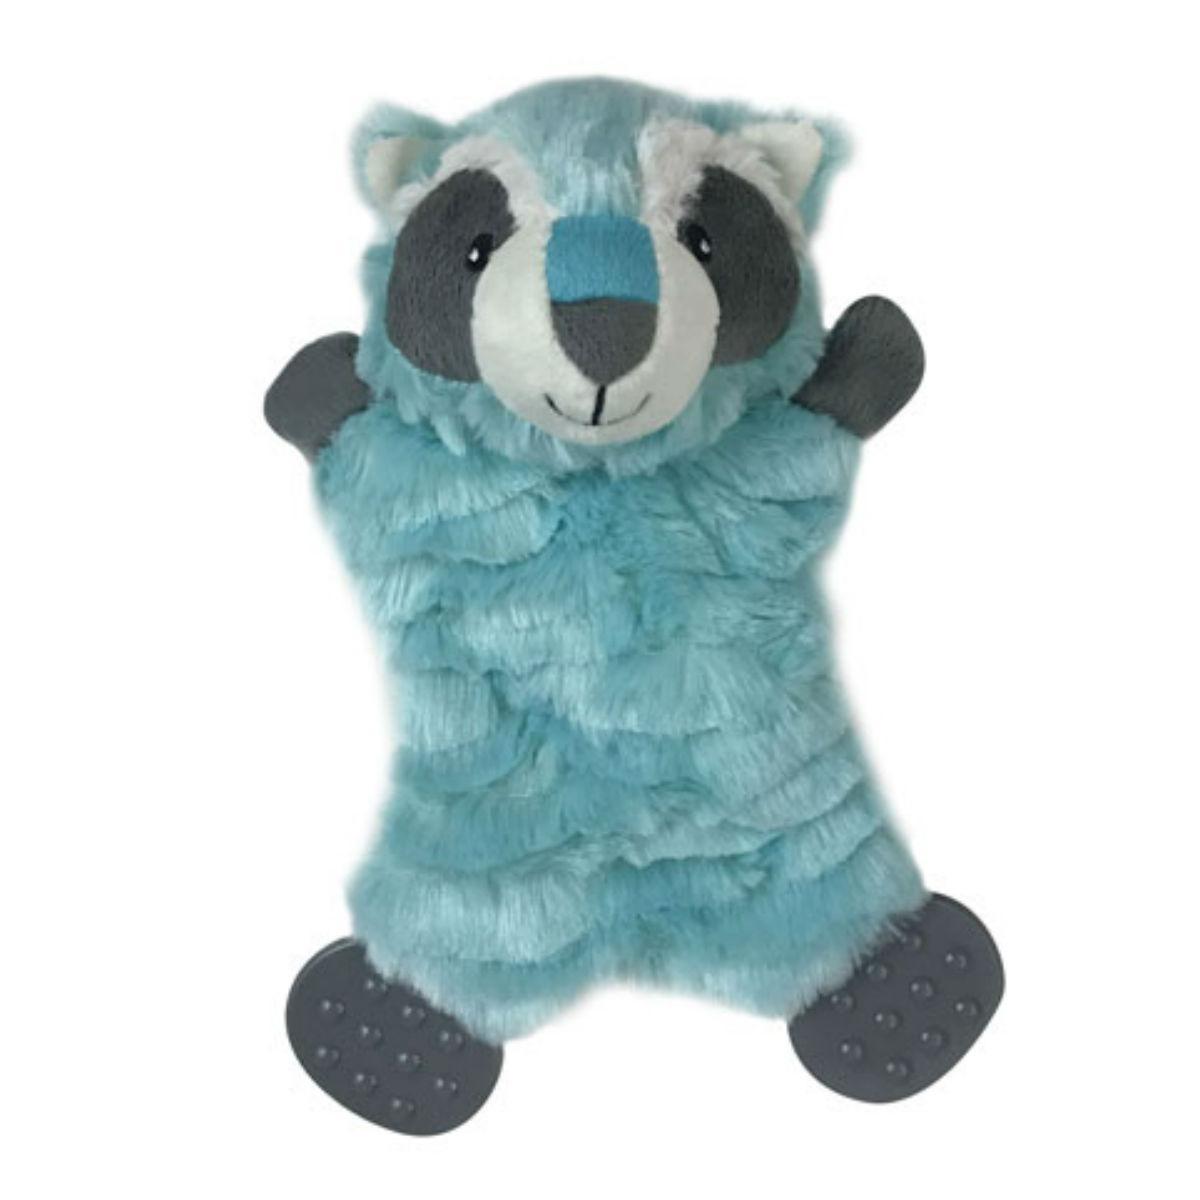 Pet Park Blvd Flatties Plush Toy - Raccoon